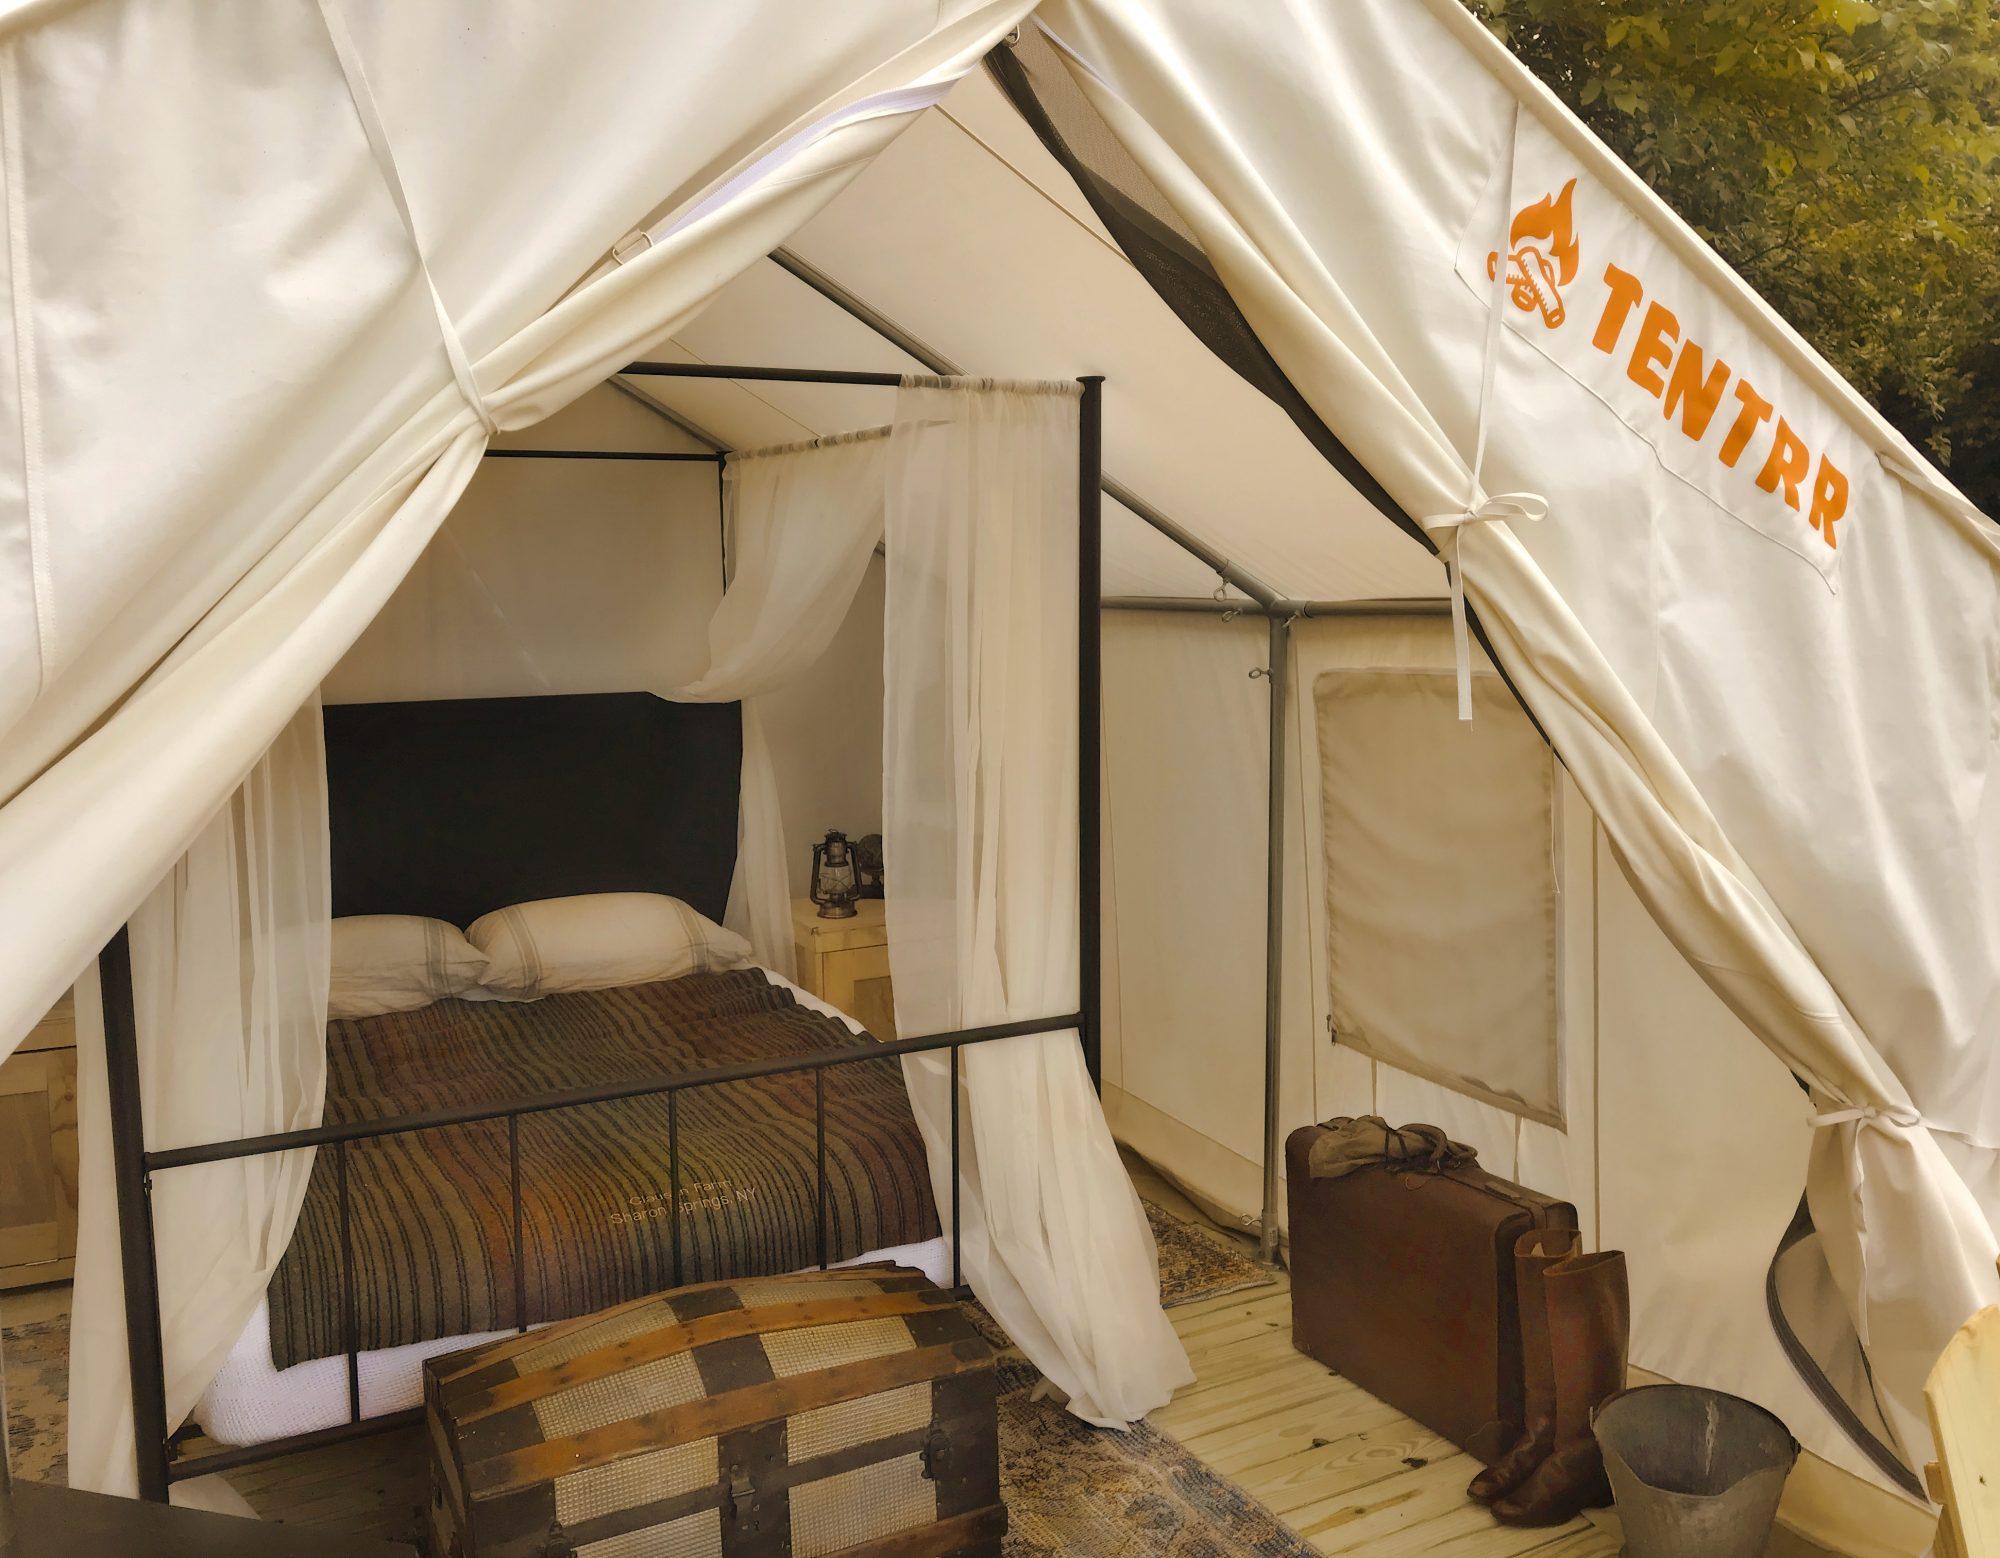 Clausen Farm tent